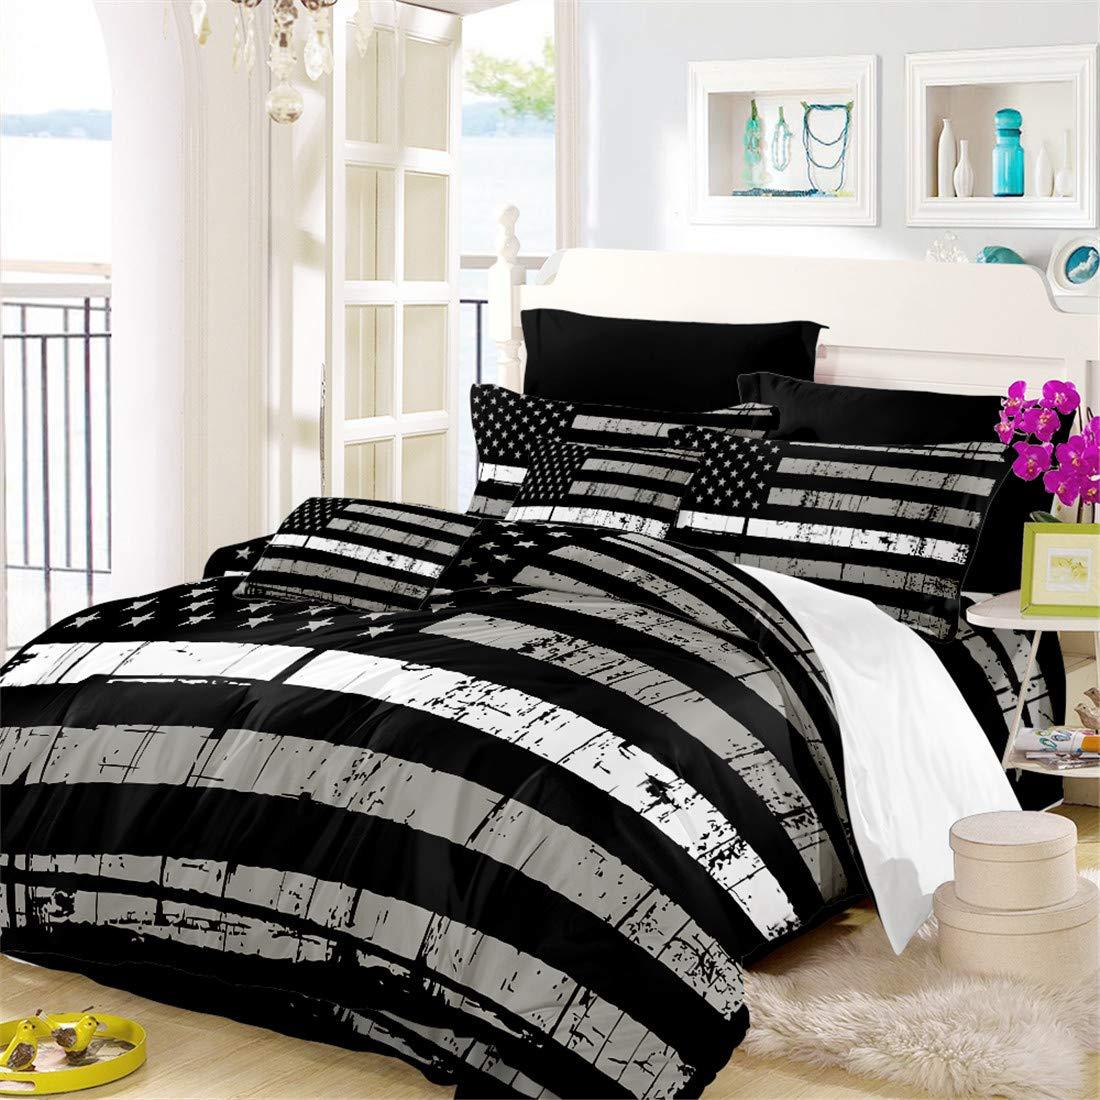 Oliven American Flag Quilt Cover Full Size Valor Patriot Theme Digital Duvet Cover 3 Piece Bedding Set,Black White Gray